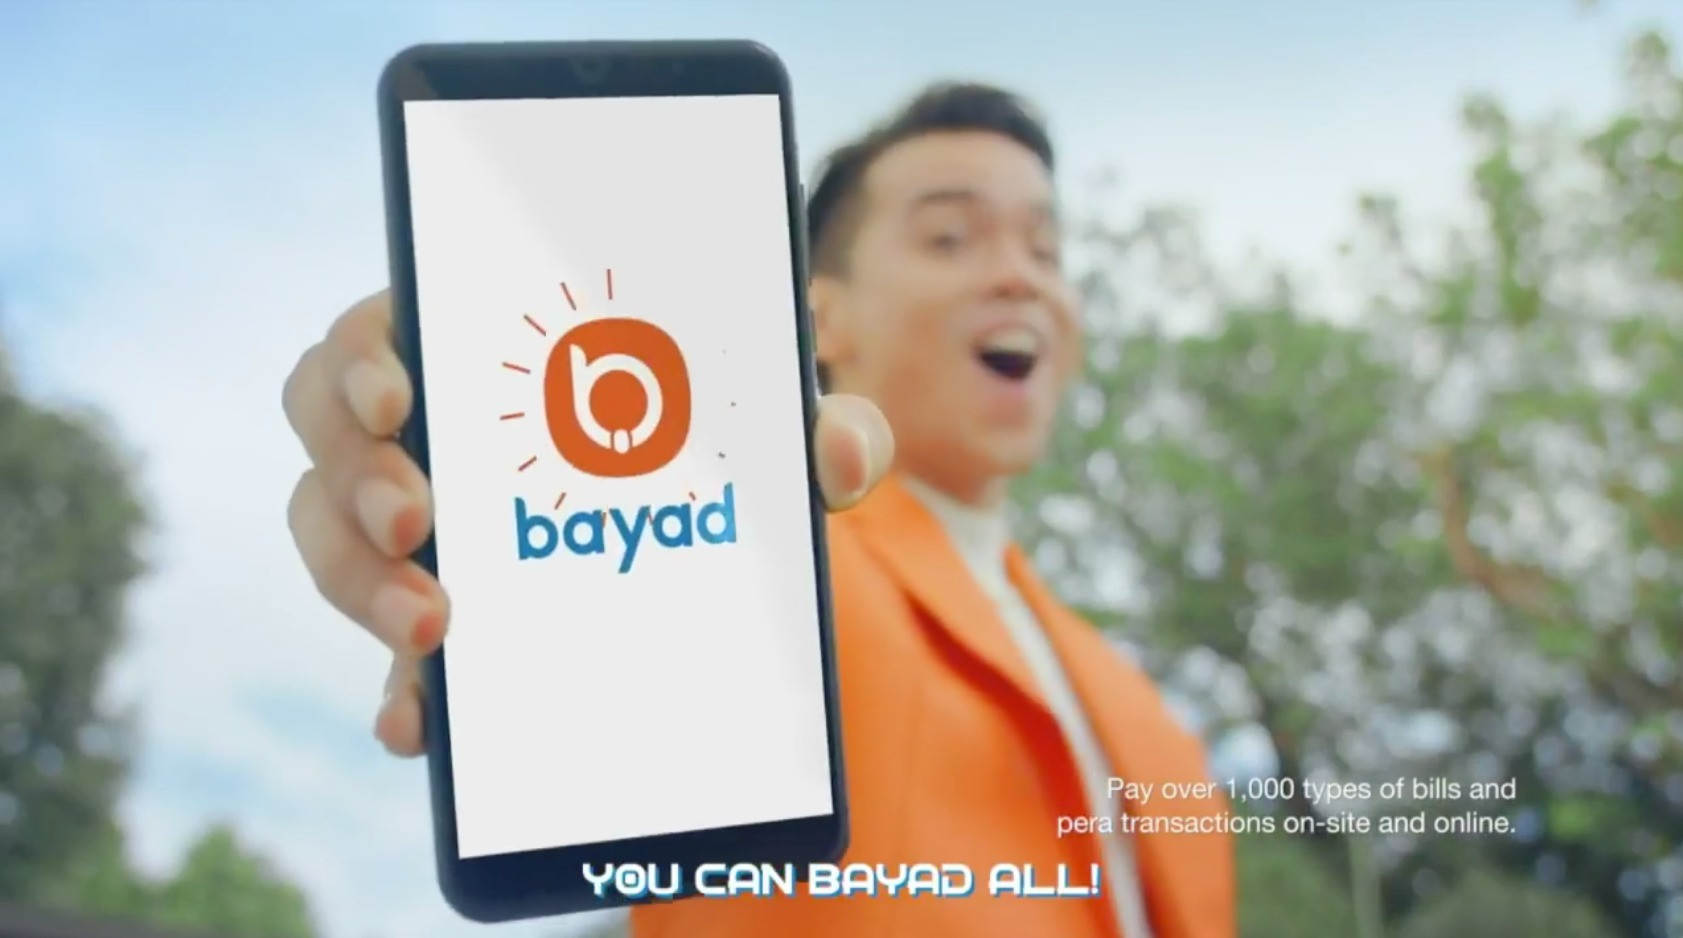 #BayadAll with the BAYAD App